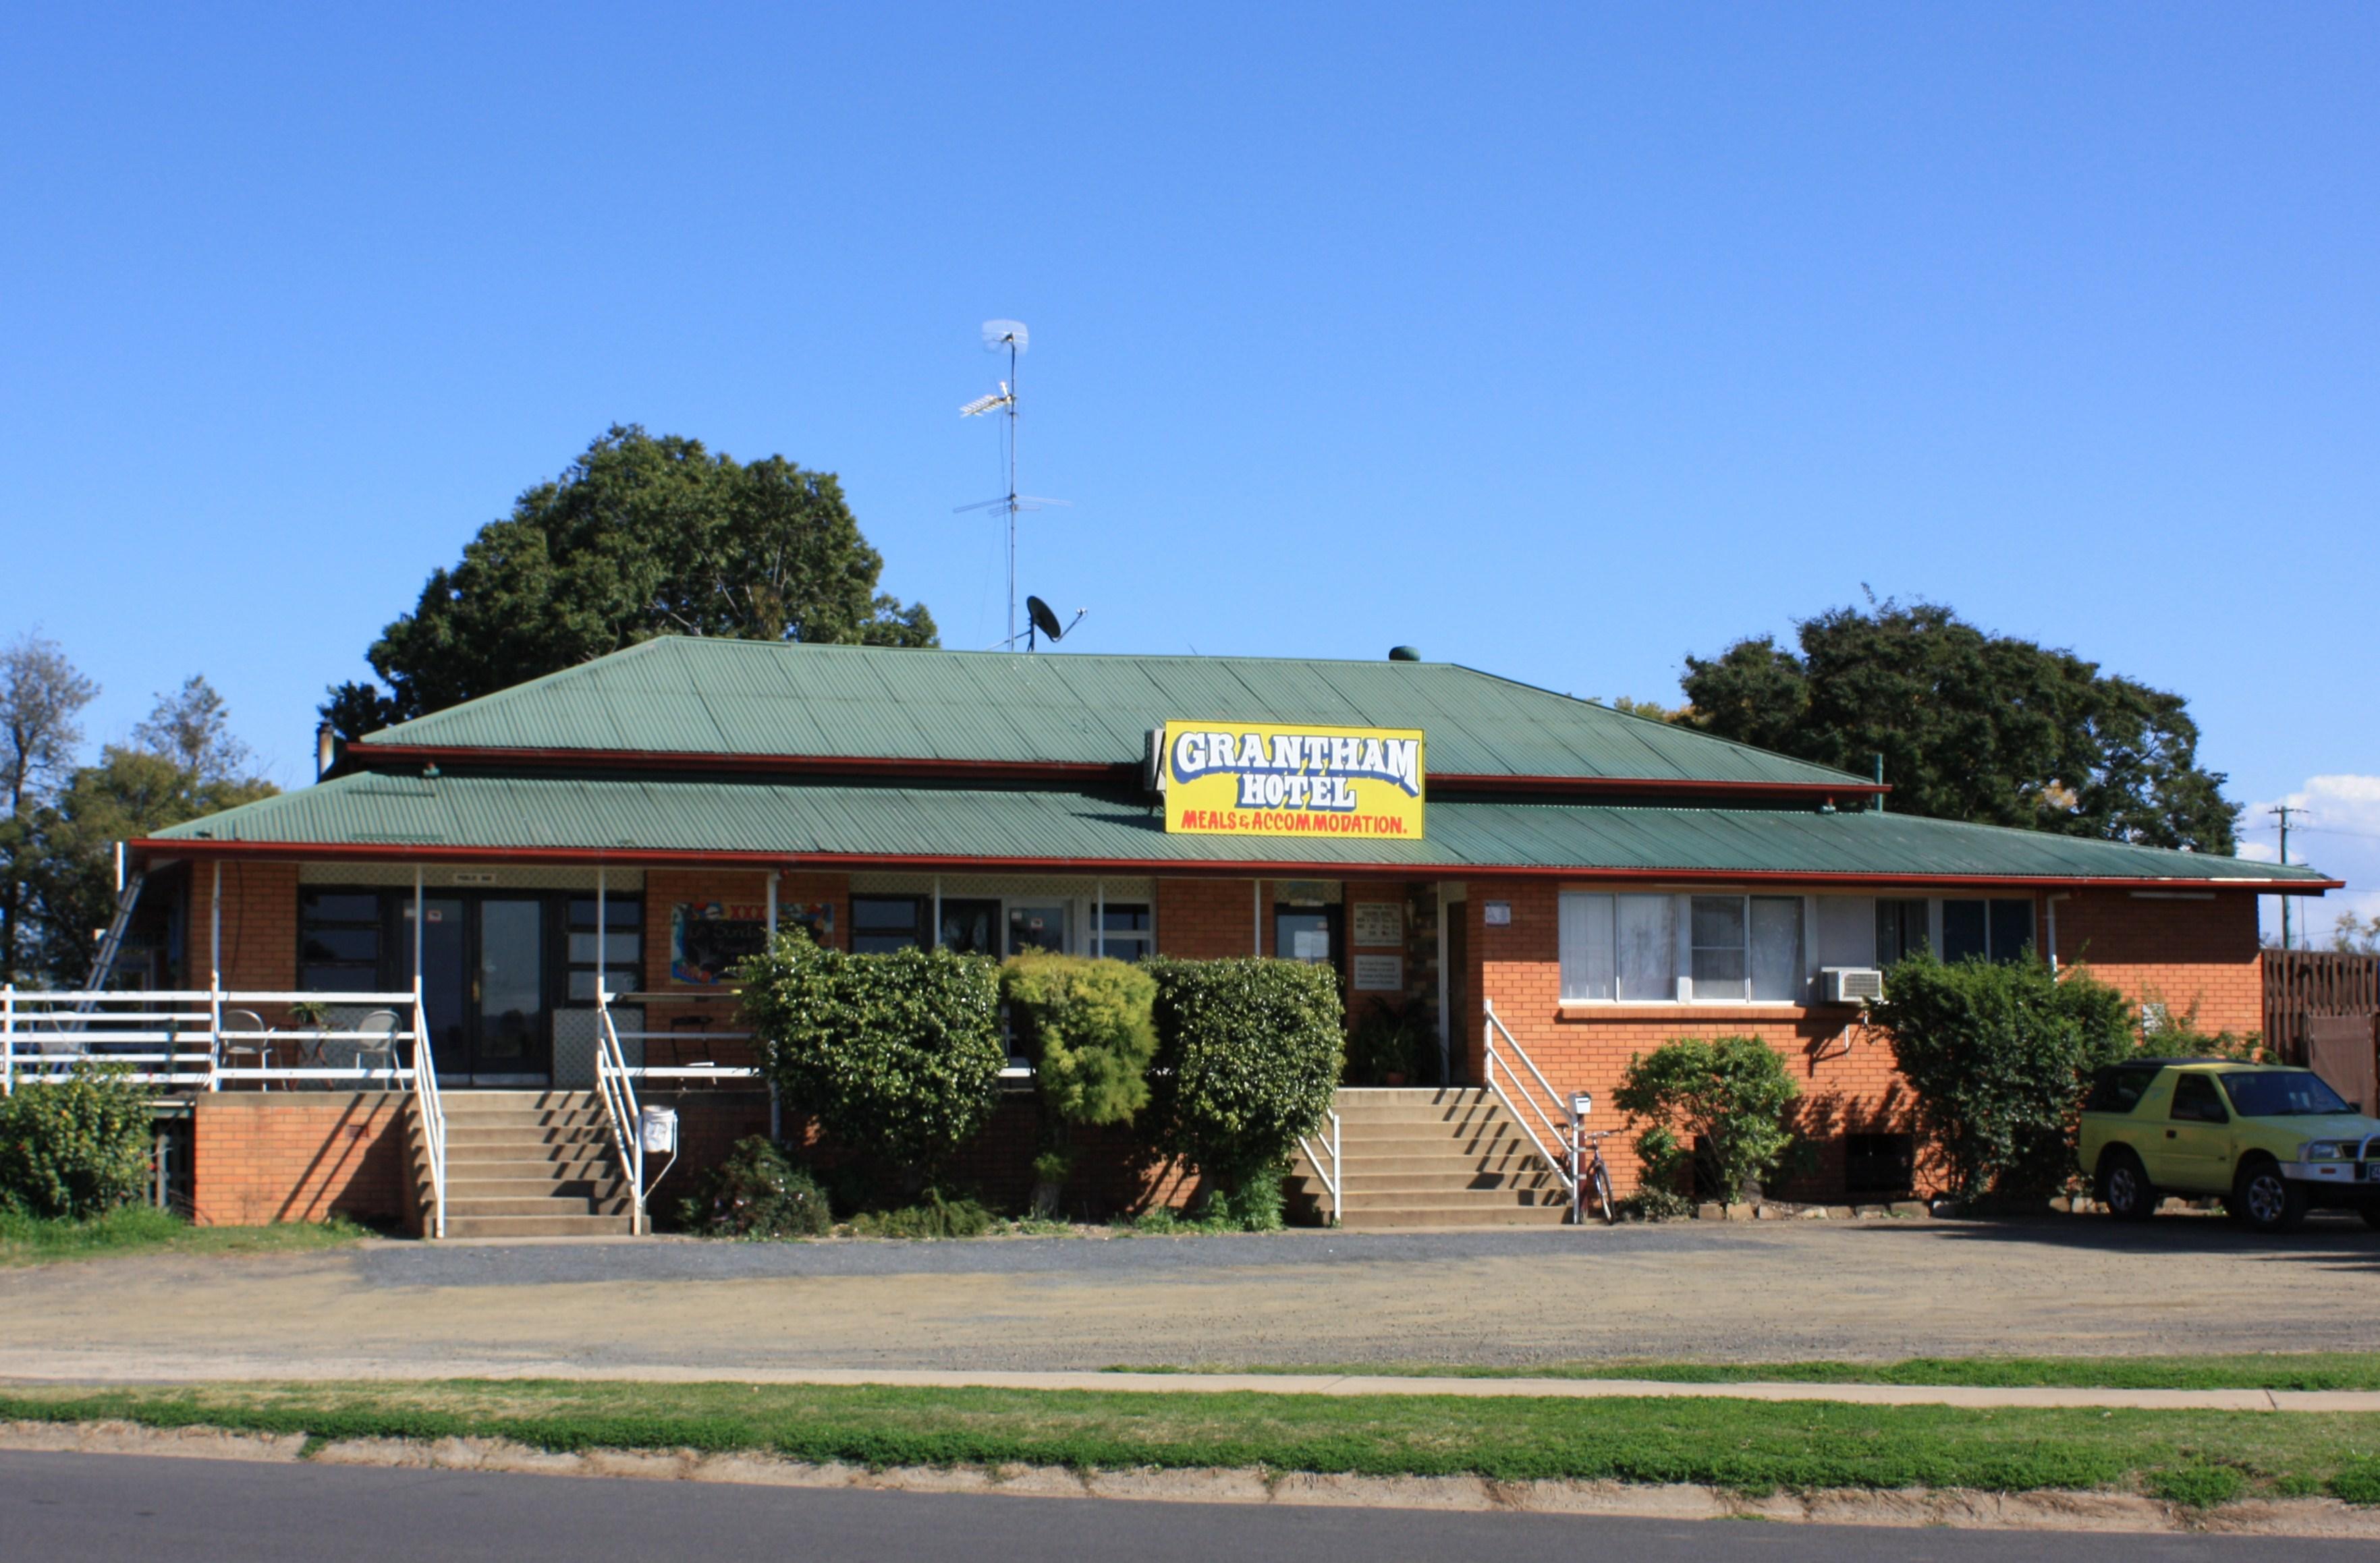 Breaking news on Grantham, Queensland, Australia ...